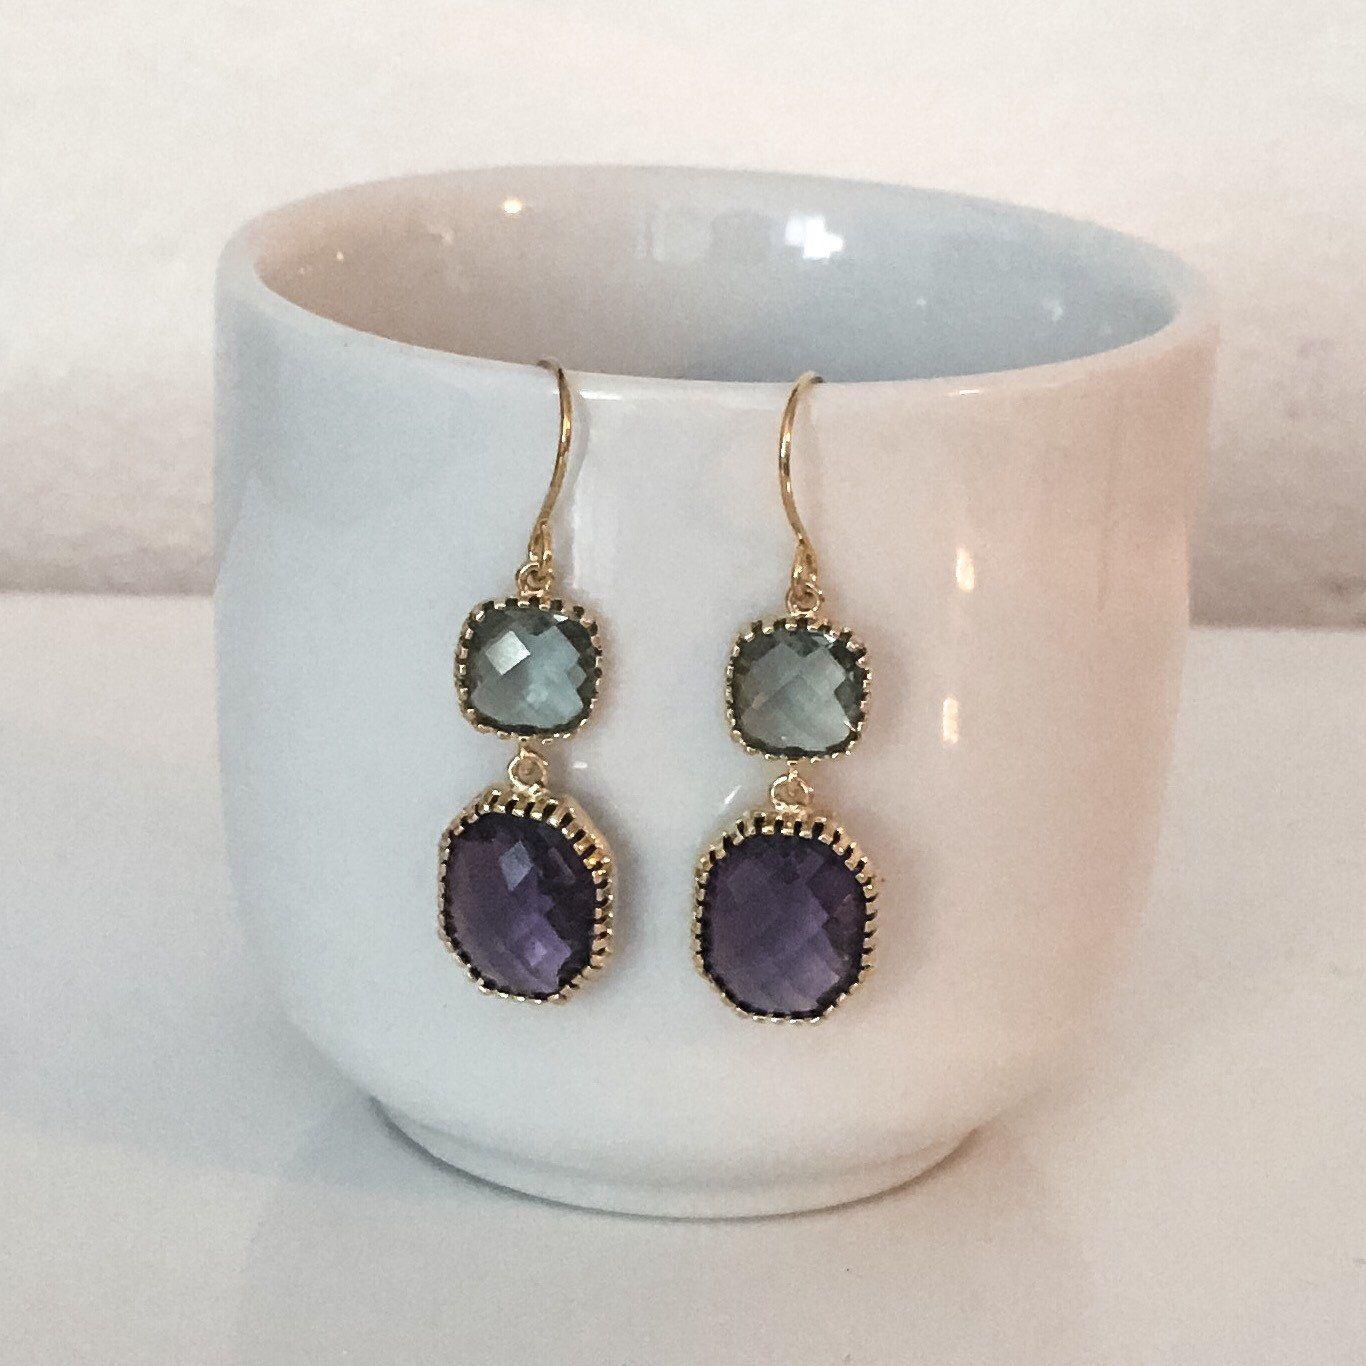 Black Diamond & Tanzanite (faux) Dangle Earrings by TheArtsyNomad on Etsy https://www.etsy.com/listing/294801551/black-diamond-tanzanite-faux-dangle